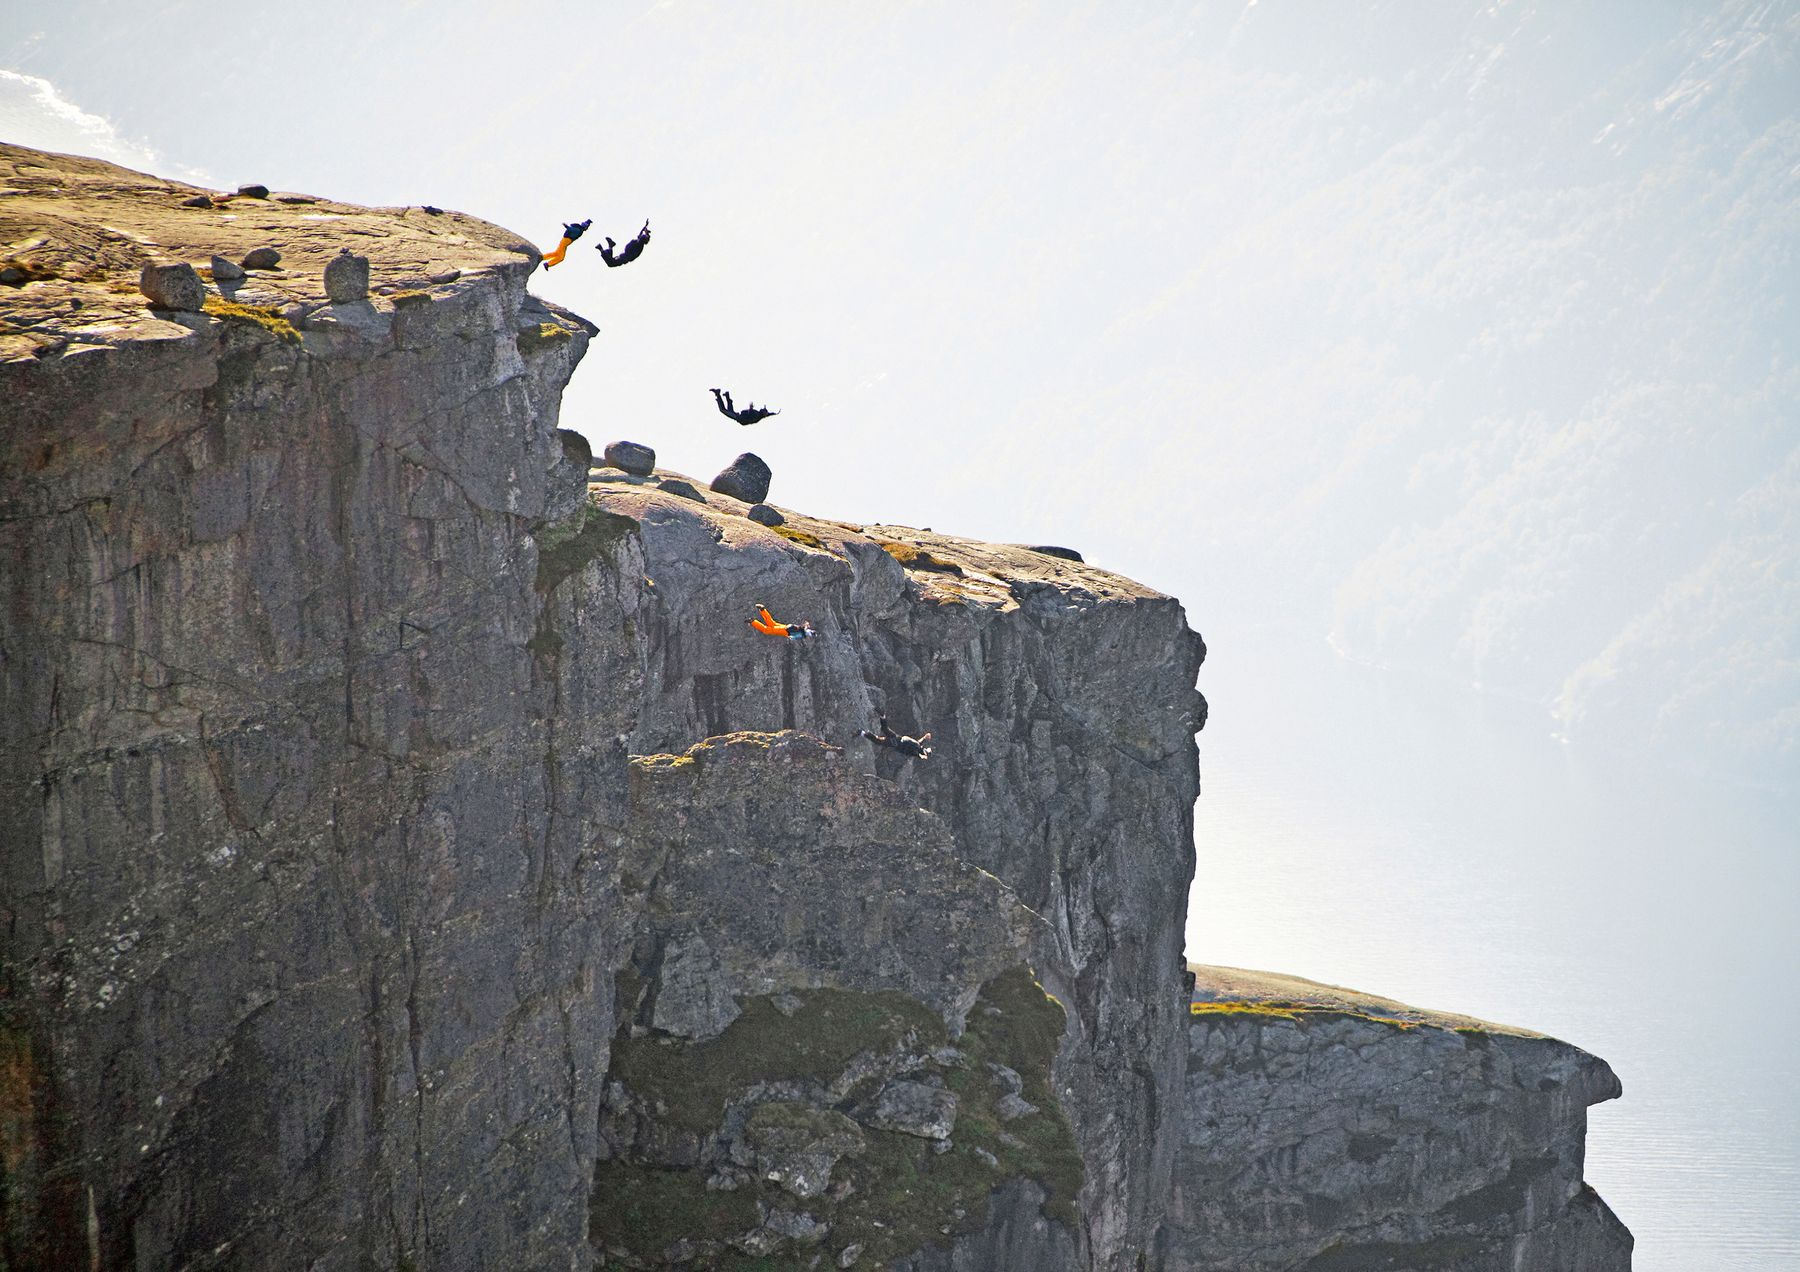 Erlebnisreisen in Norwegen: Base-Jumping